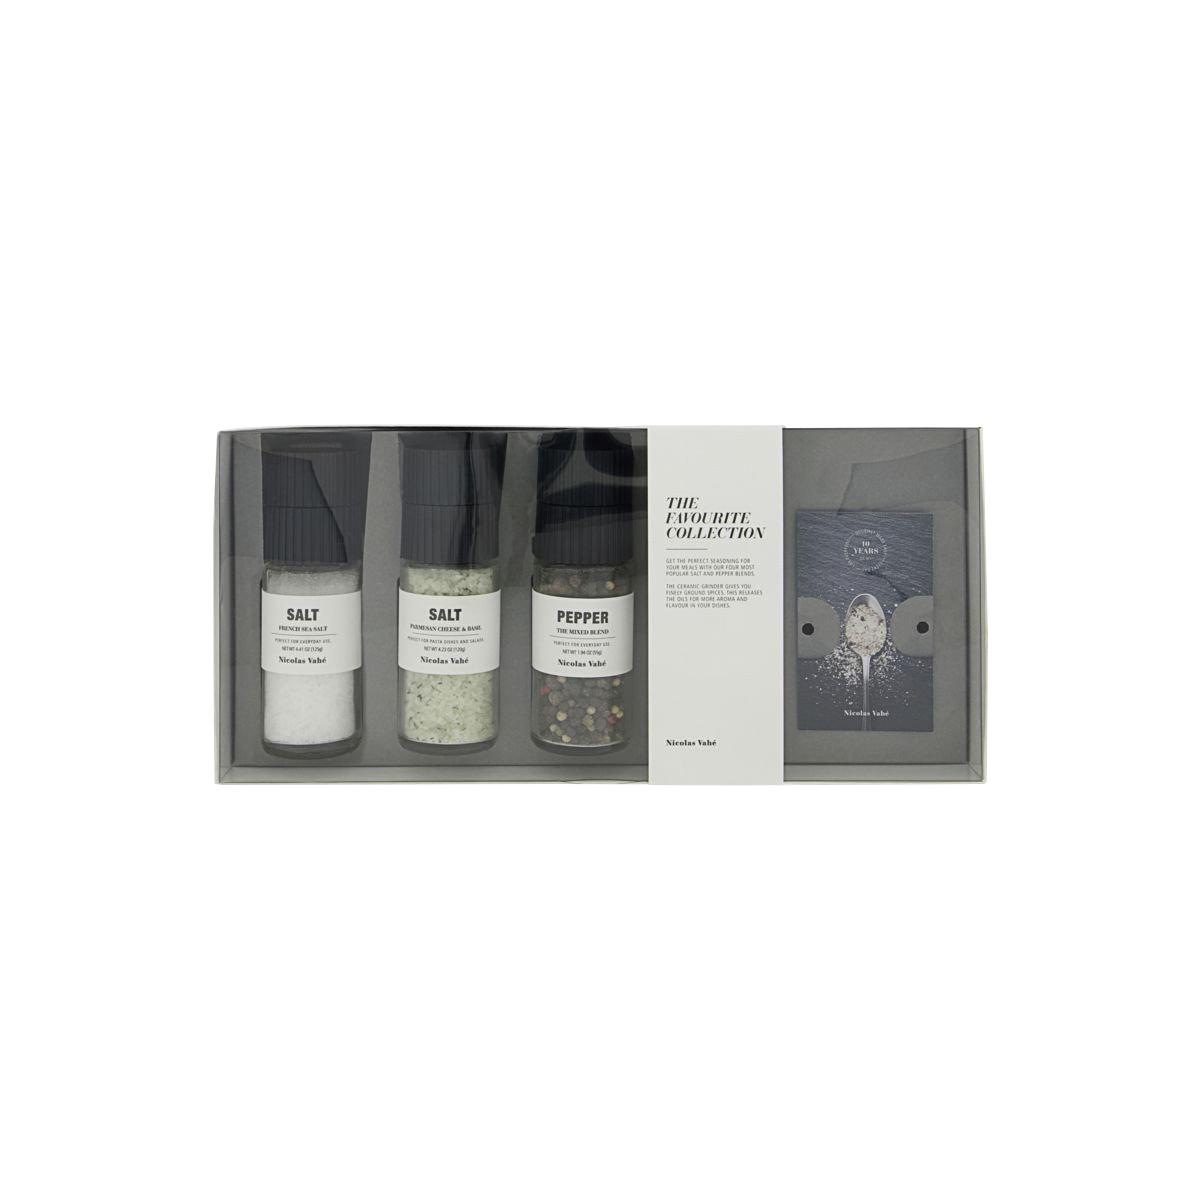 Nicolas Vahé - Favorite Collection Gift Box (104980710)